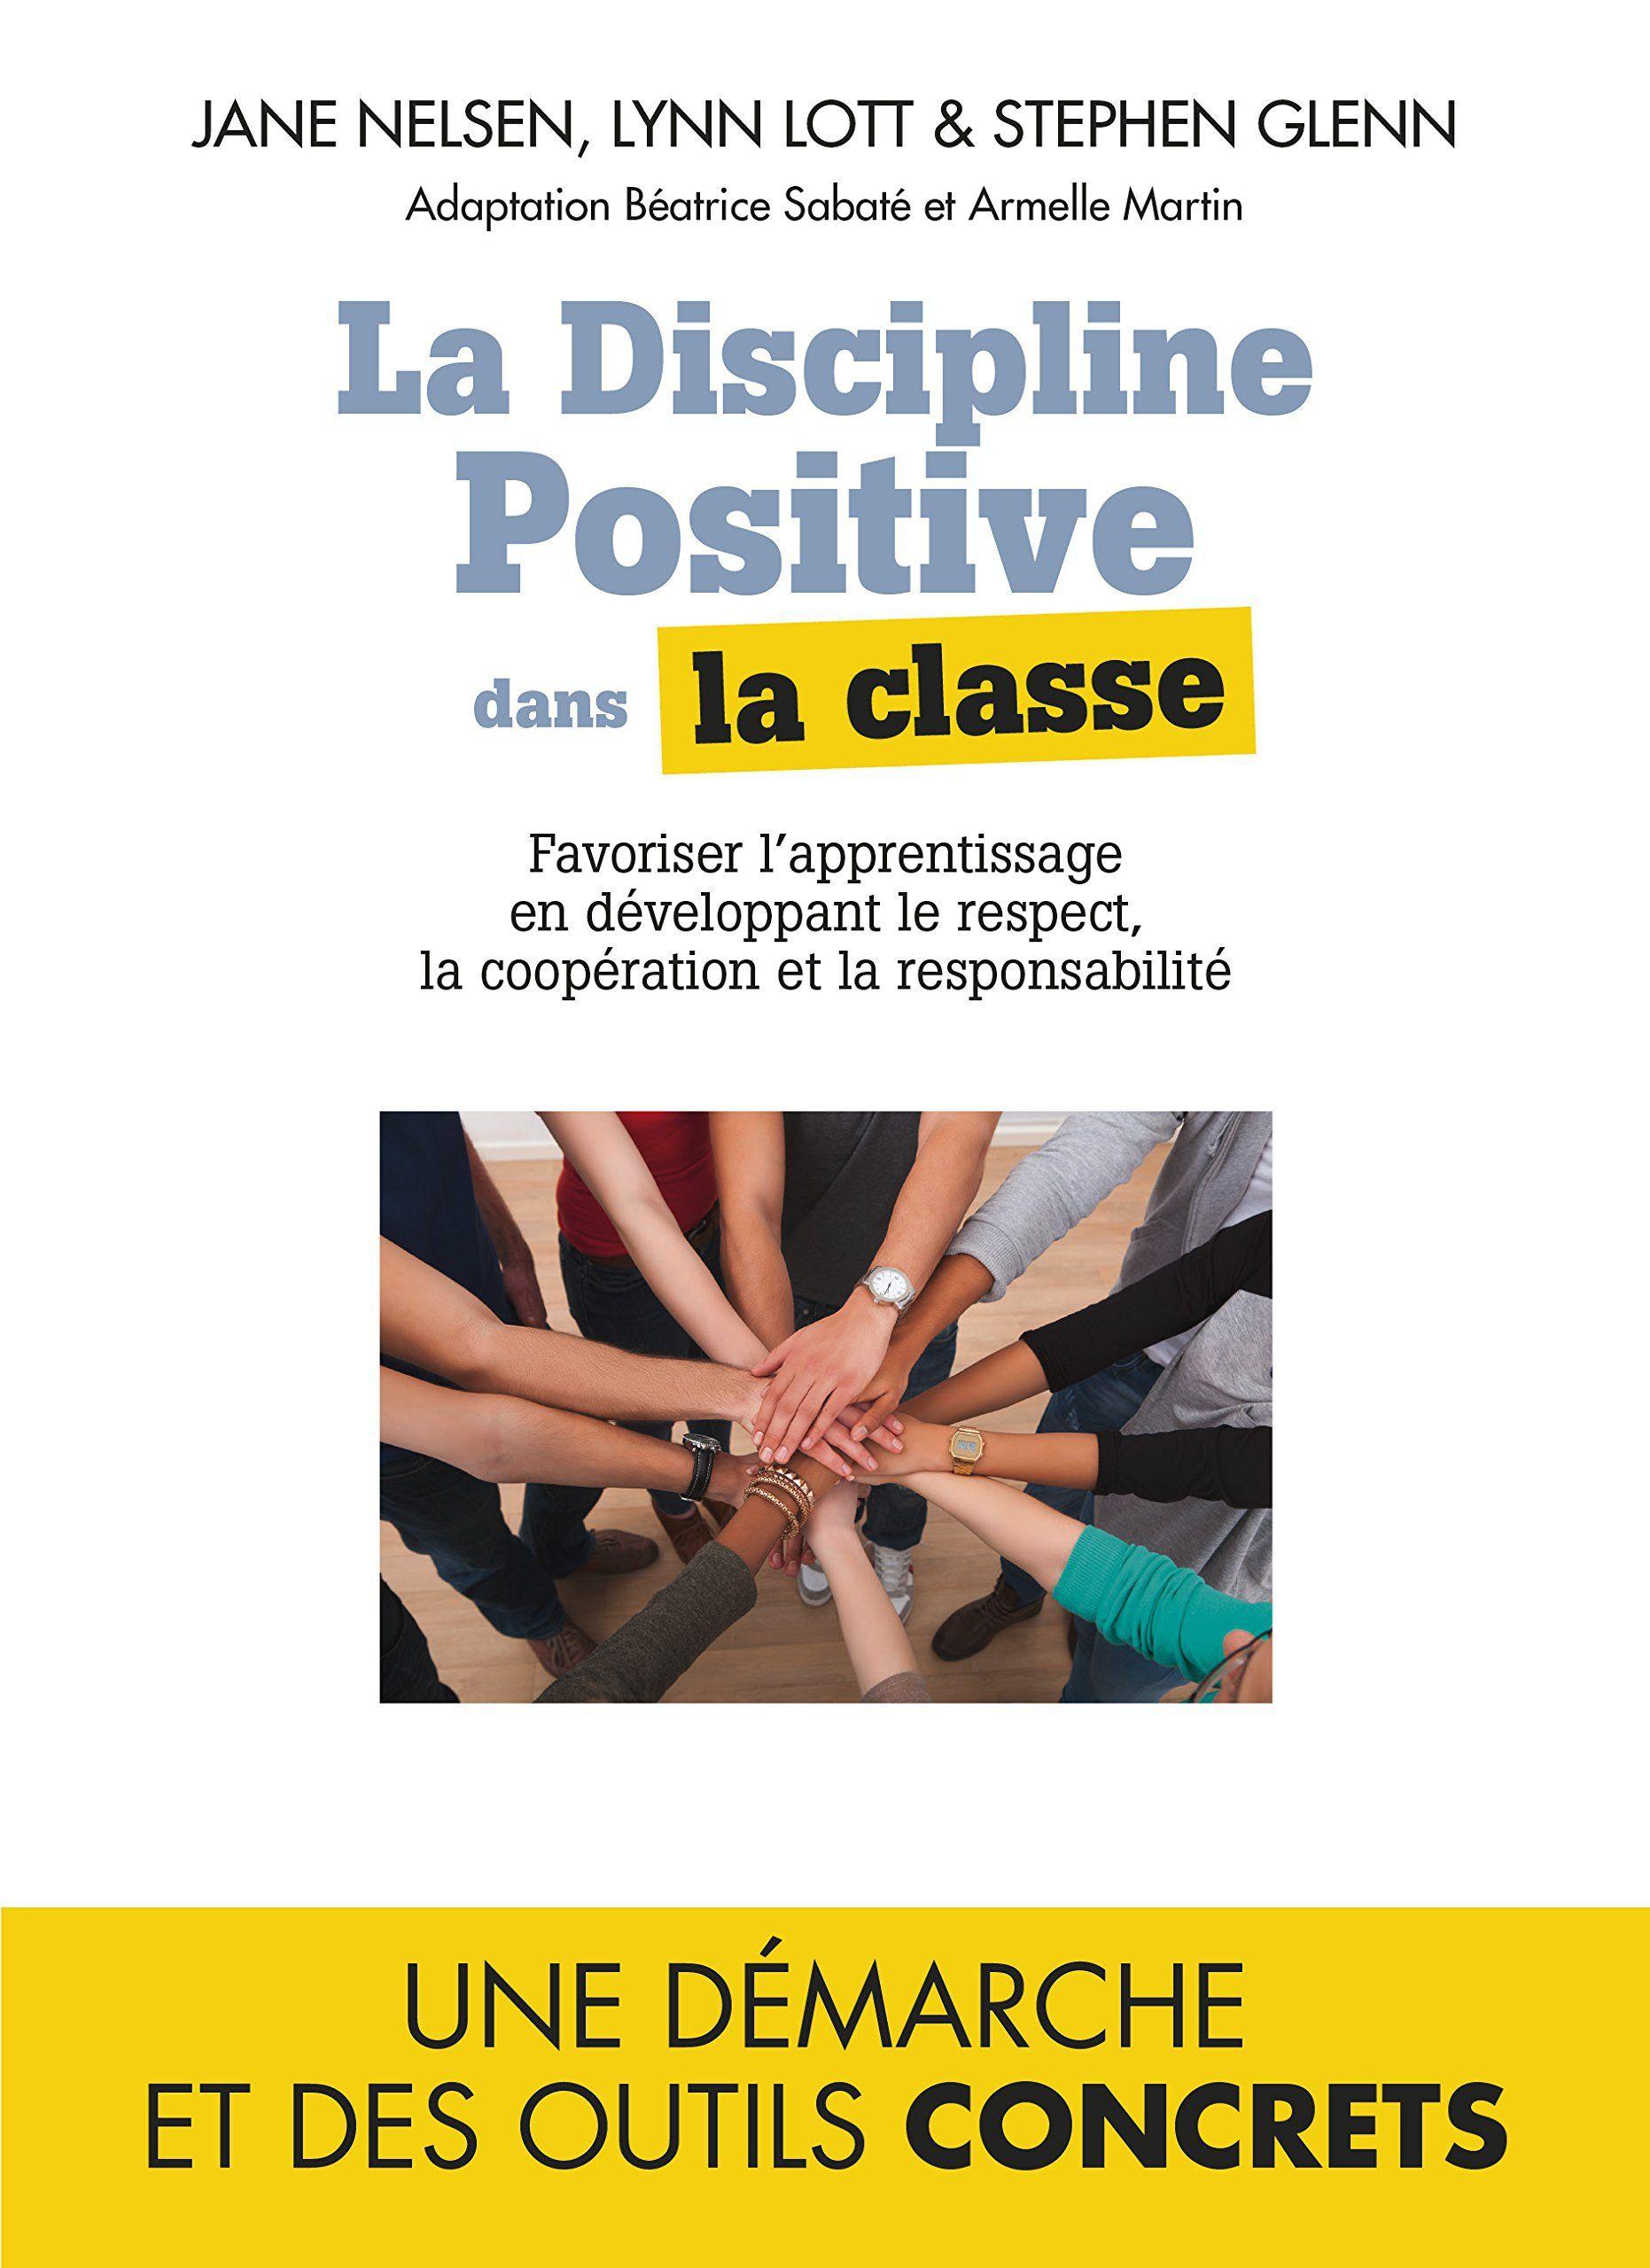 Epingle Sur Teaching